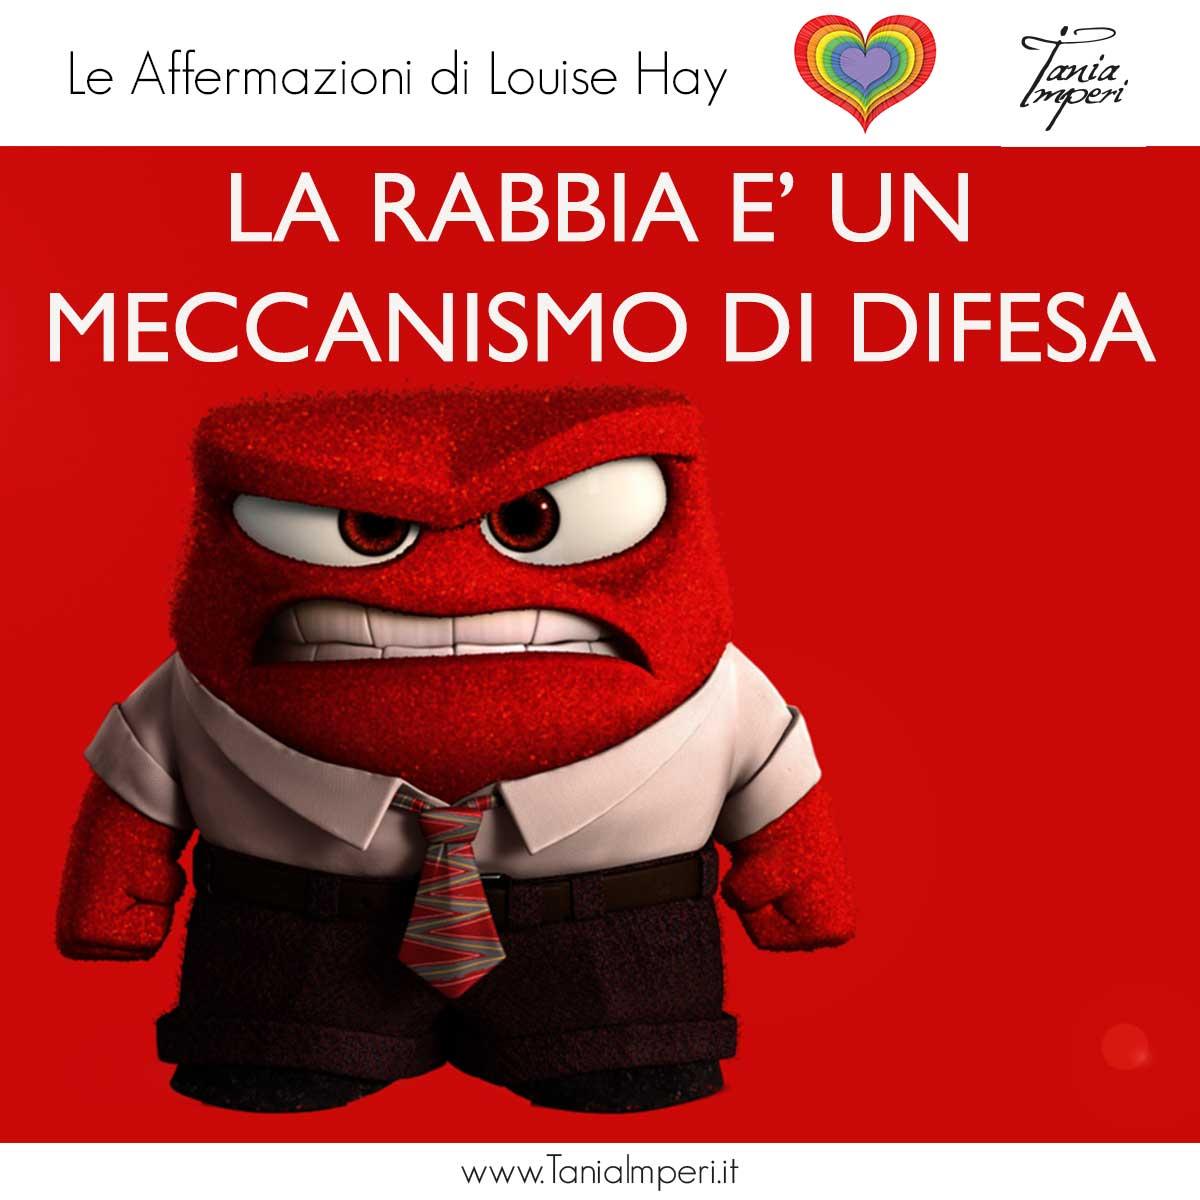 AFFERMAZIONI_LOUISE_HAY_TANIA_IMPERI_18_RABBIA_MECCANISMO_DI_DIFESA-01MAG2017